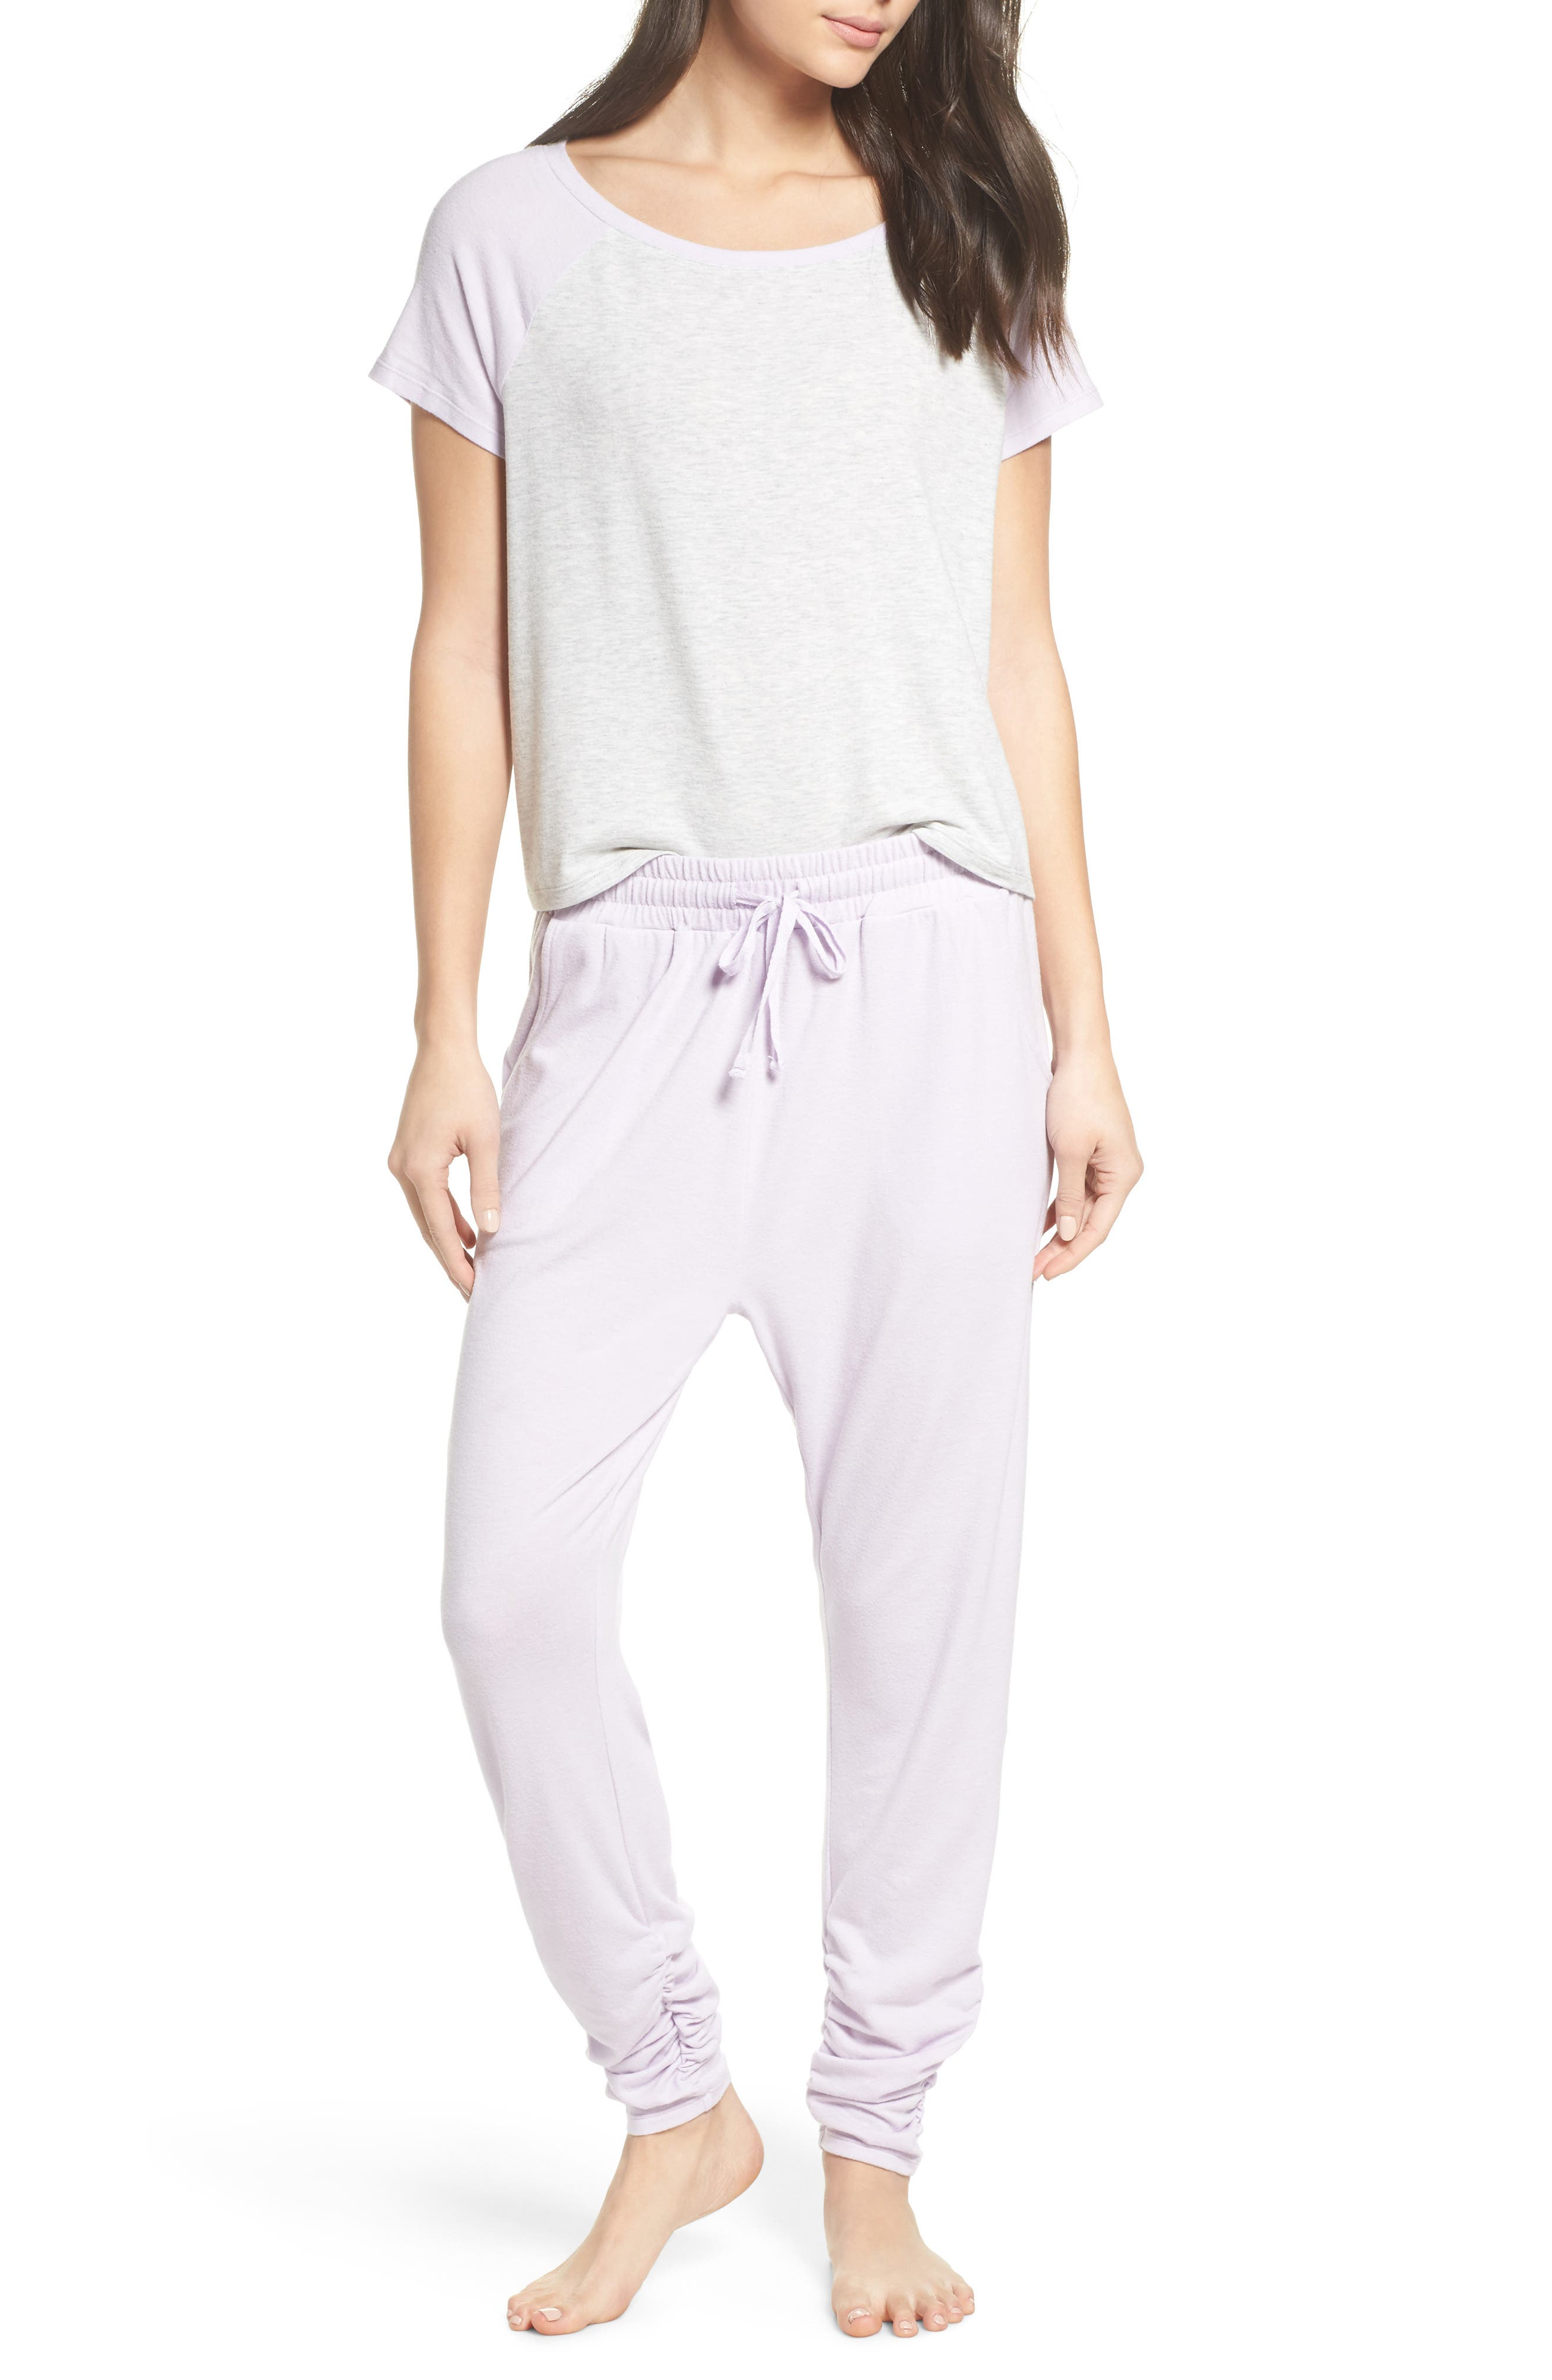 Cloud 9 Pajamas,                         Main,                         color, 050